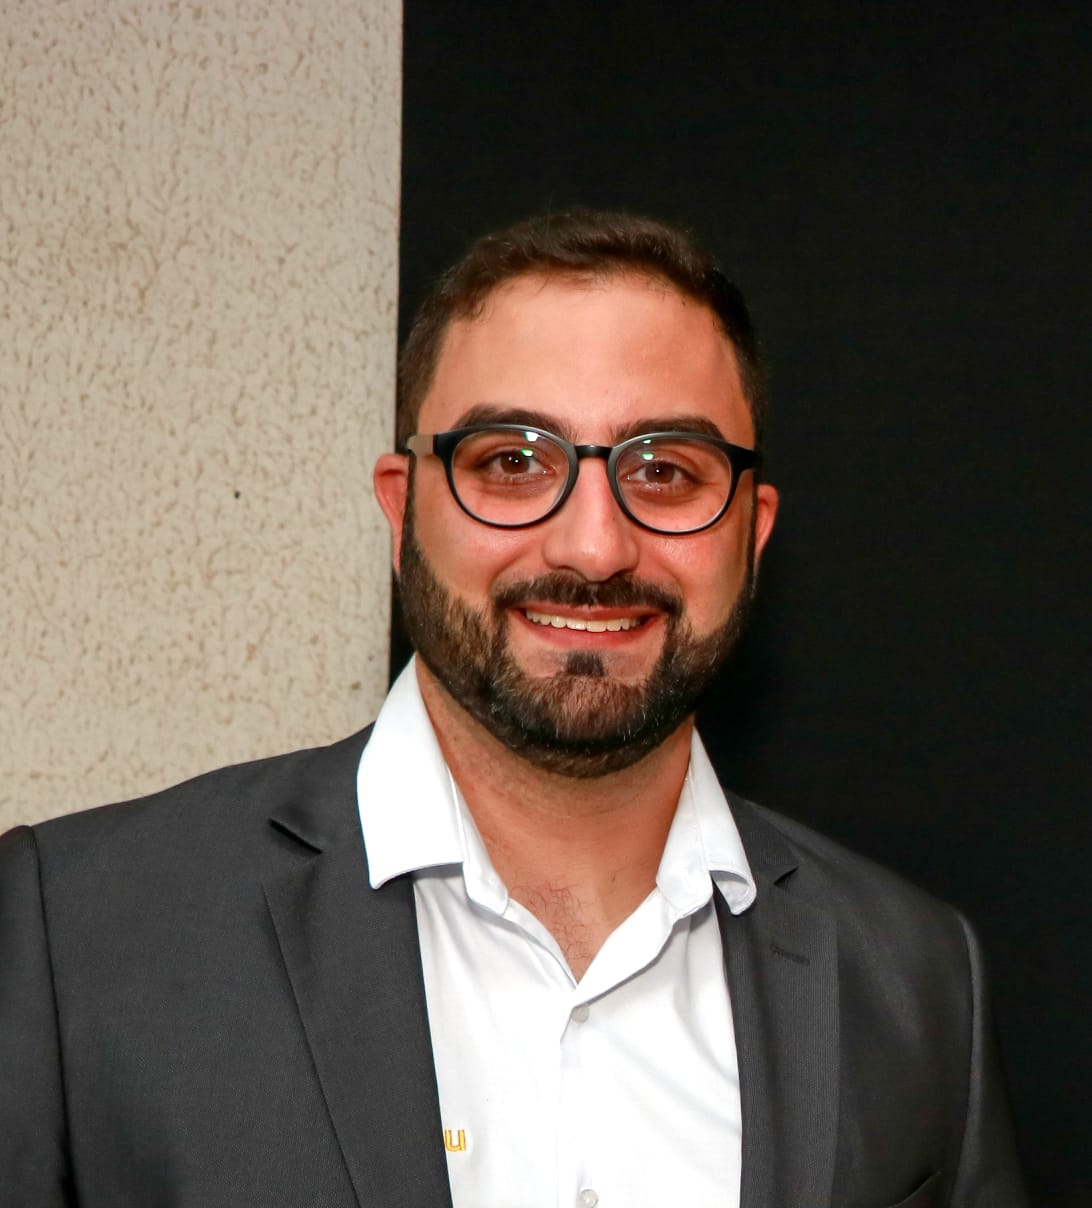 Luiz Portal